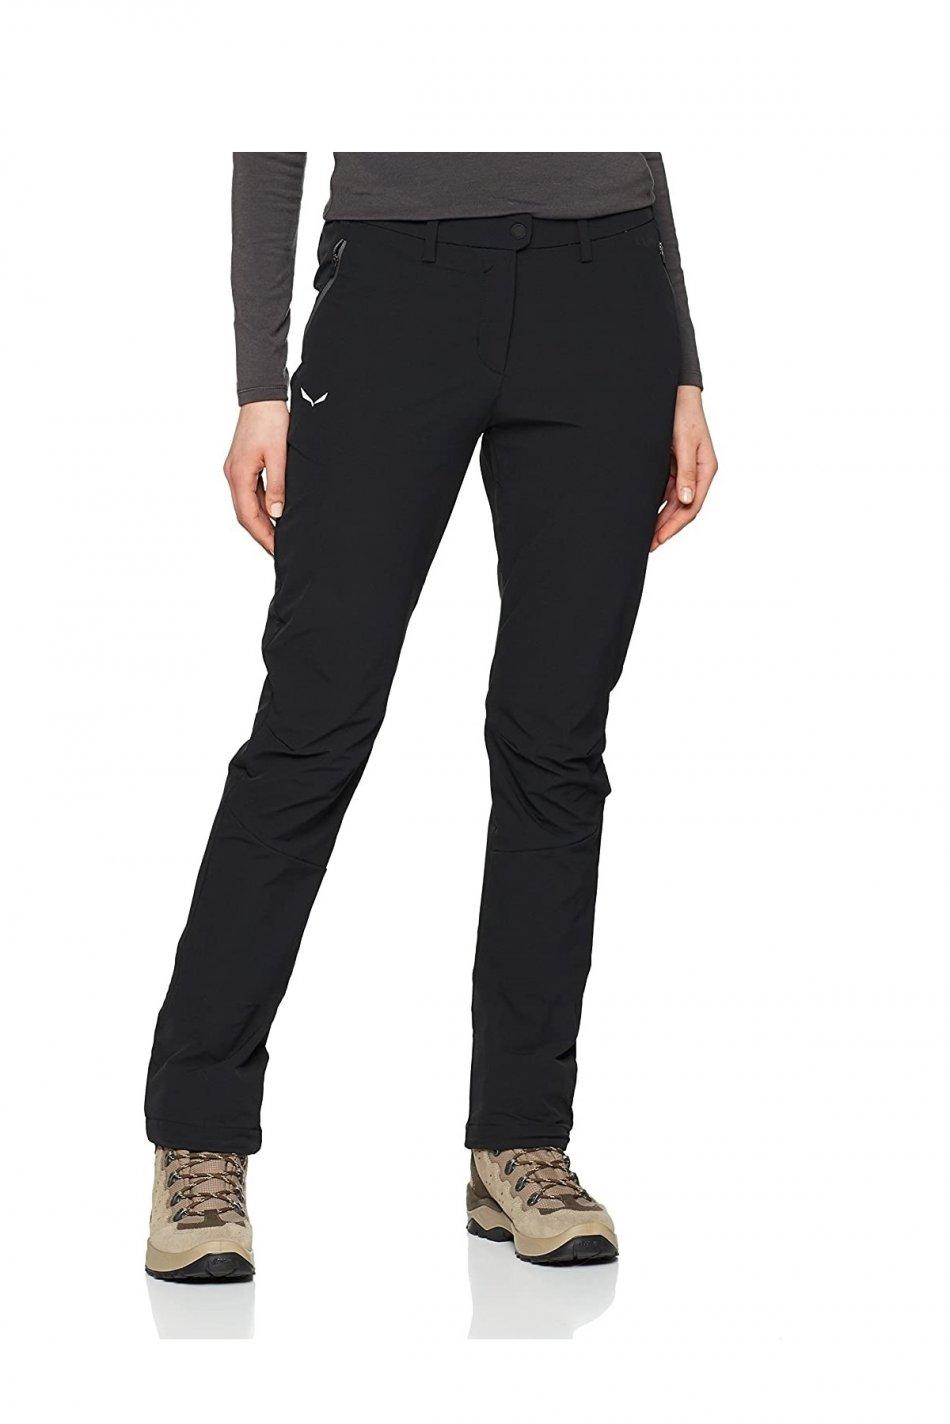 Pantaloni dama, Salewa, Negru, M